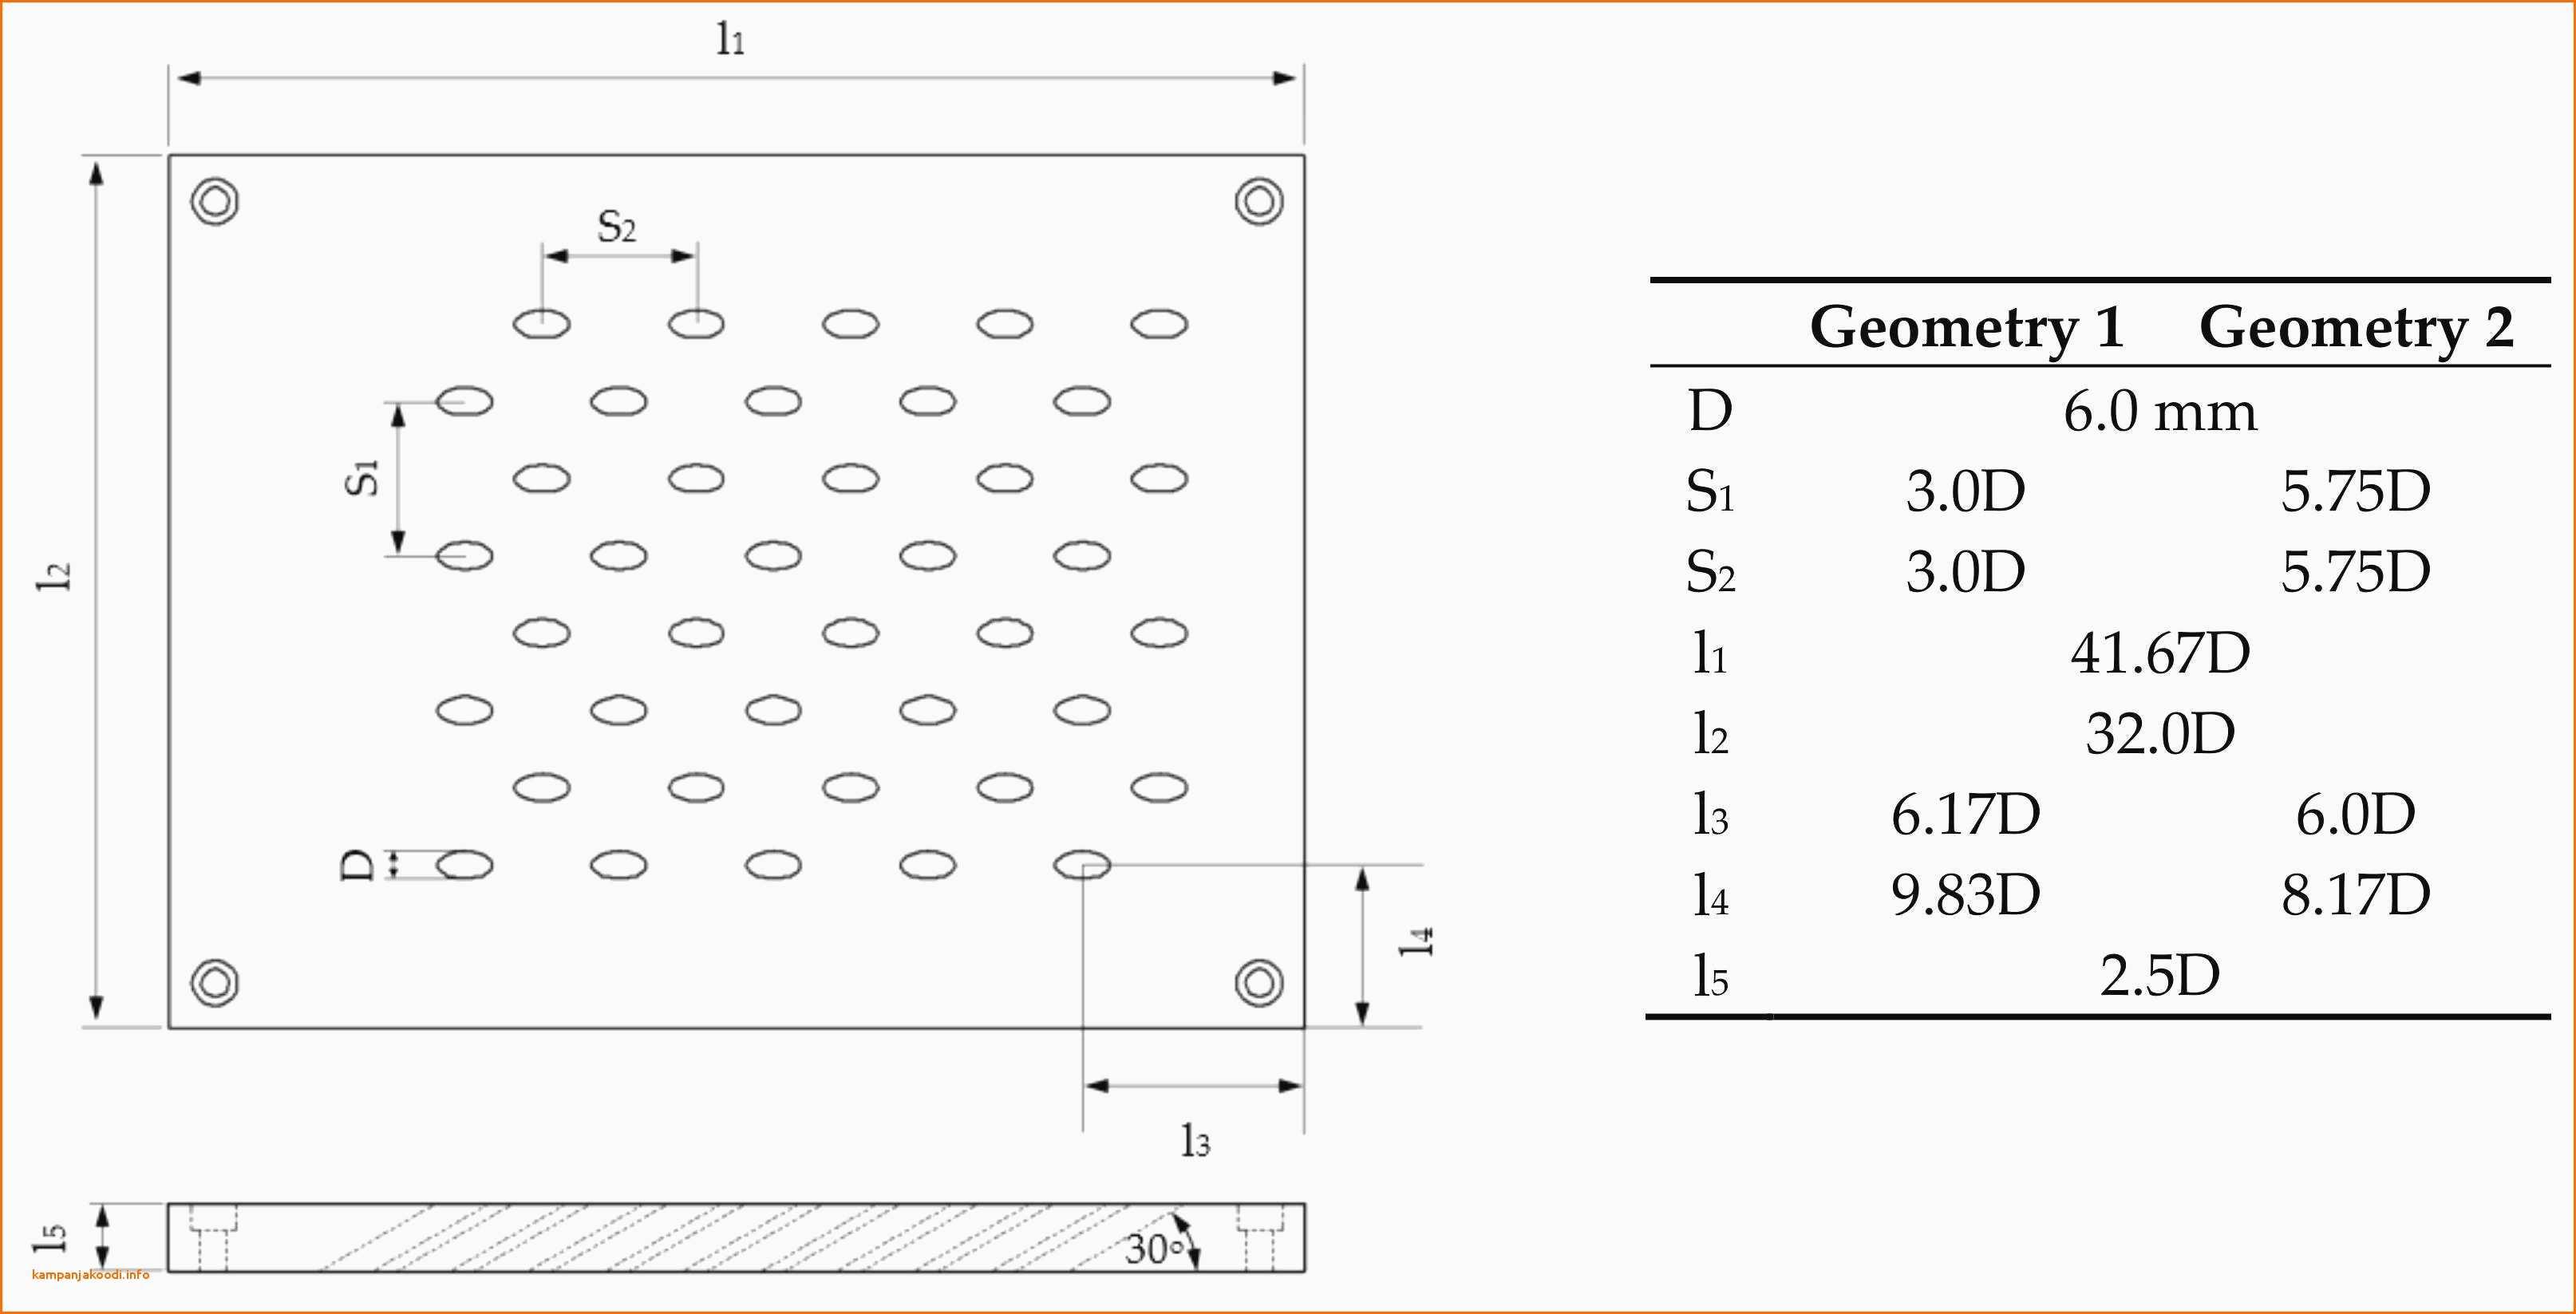 Templates. Bid Proposal Sample: Bid Proposal Template Free Printable - Free Printable Hr Forms